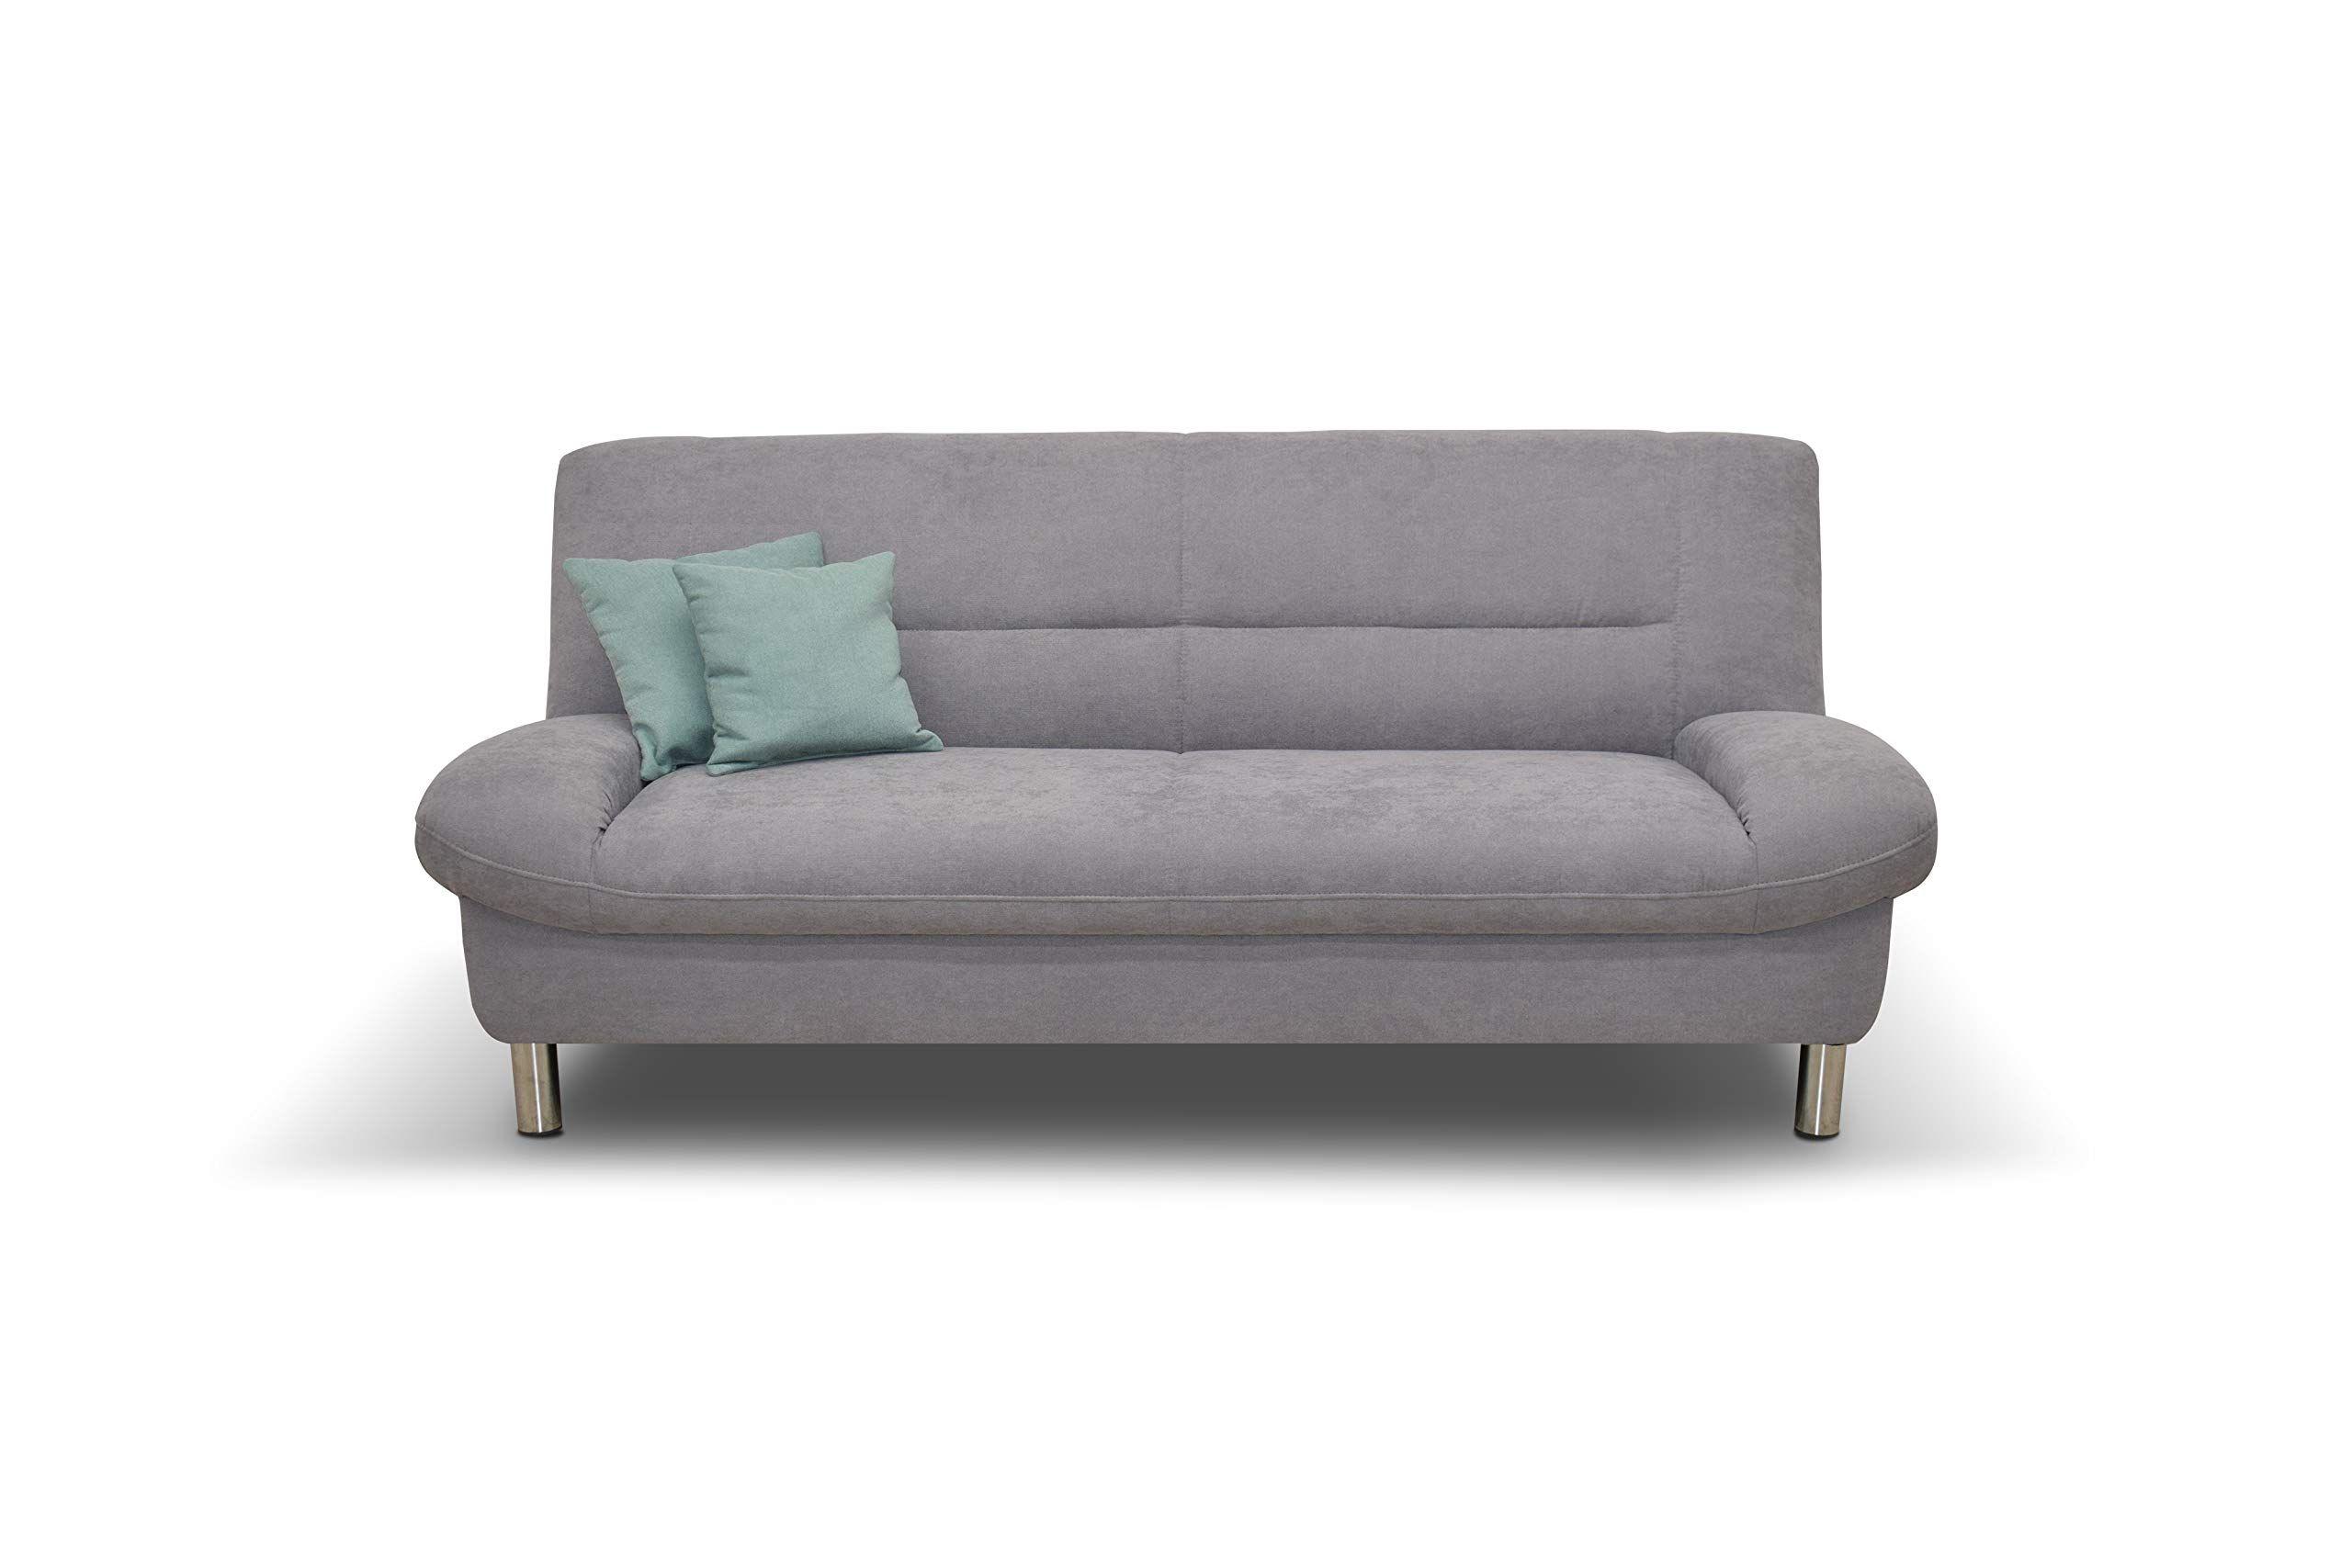 Domo Collection Asti Couch 2 Sitzer 2 Sitzer Sofa Breite 200 Cm Stoff Microfaser In Silber Grau 3 2 1 Sofa Garnitu In 2020 Couch 2 Sitzer 2 Sitzer Sofa Sofa